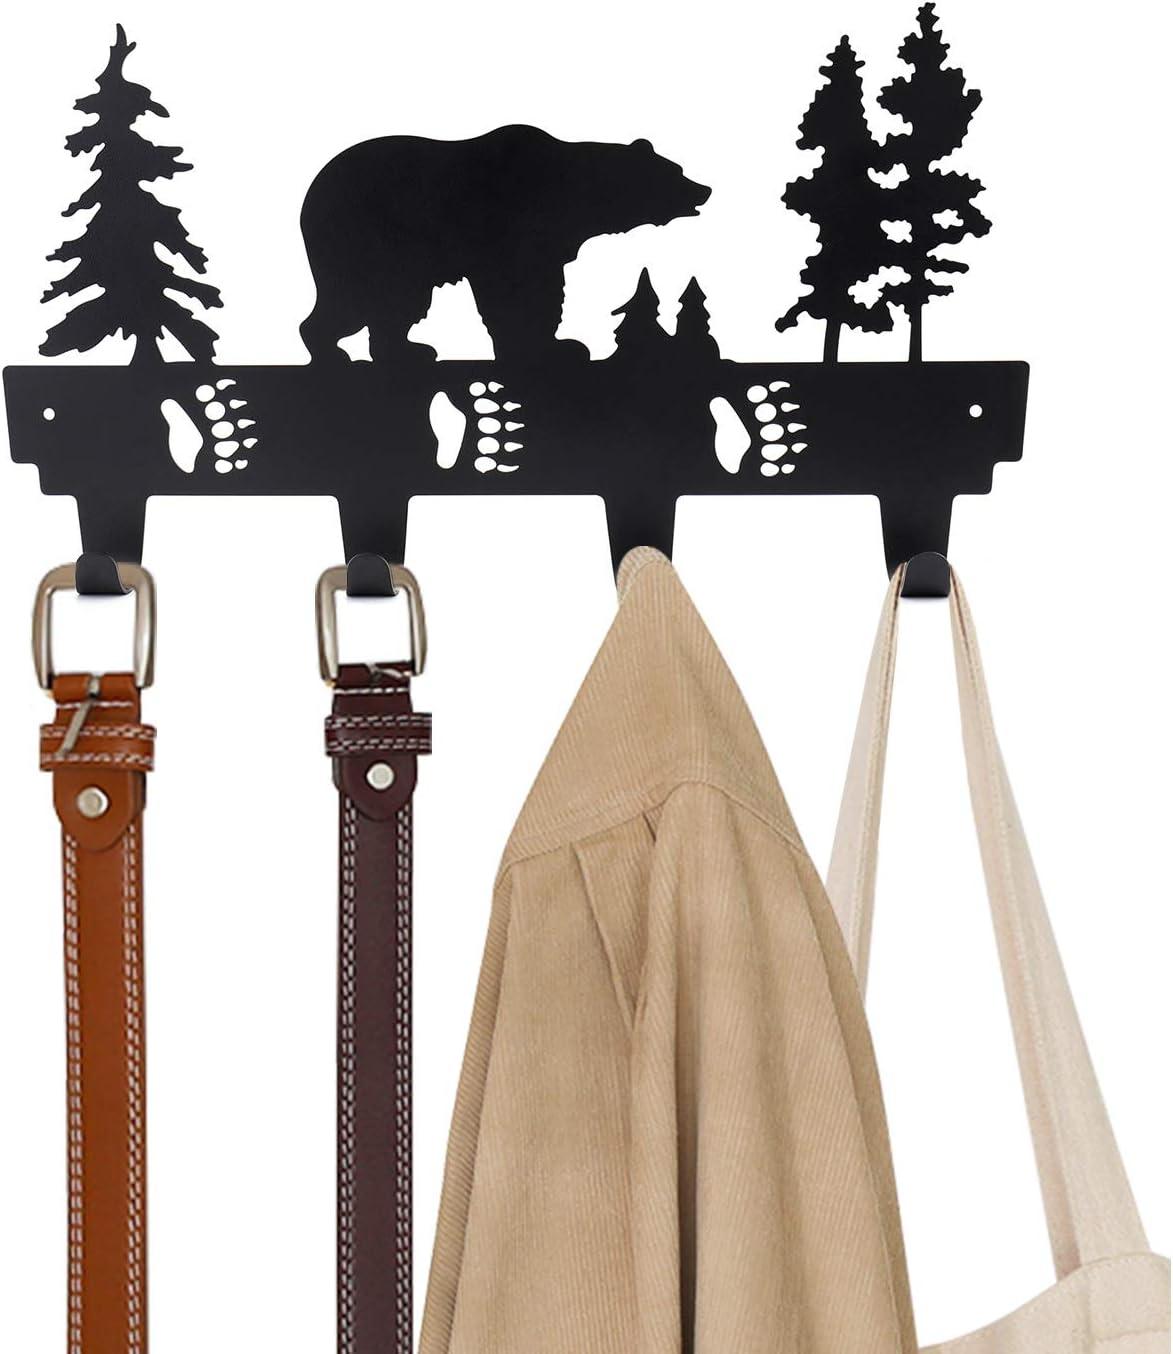 Suwimut Coat Hooks Wall Mounted, Metal Hook Hanger Rack for Bathrooms Door Hanging Key, Robe, Bag, Hats, Bear Pattern, 4 Hooks, Black